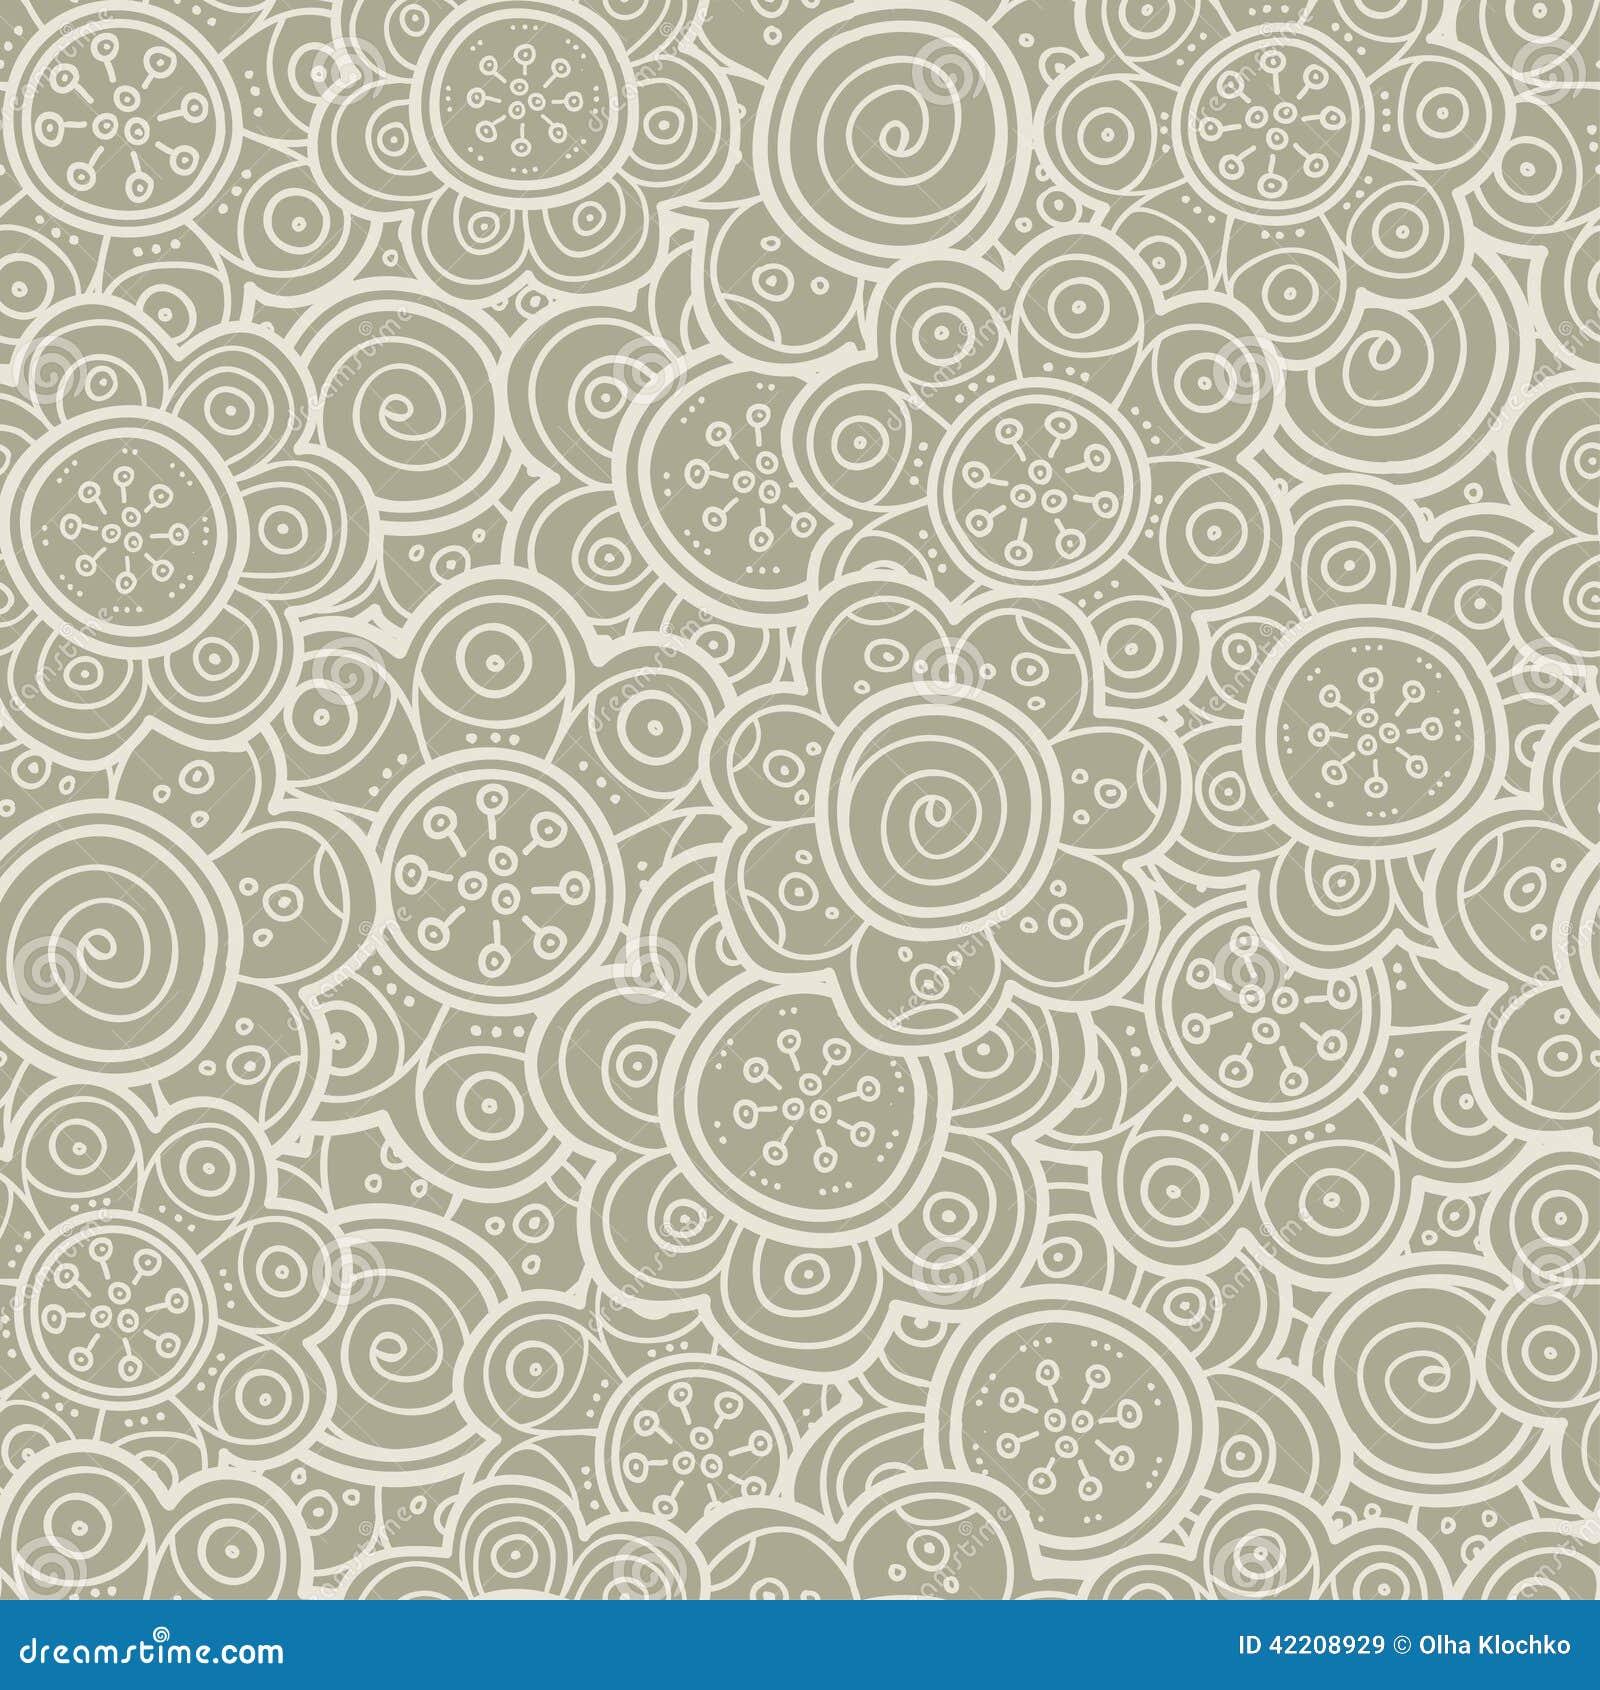 Floral Seamless Pattern Vector Illustration Background